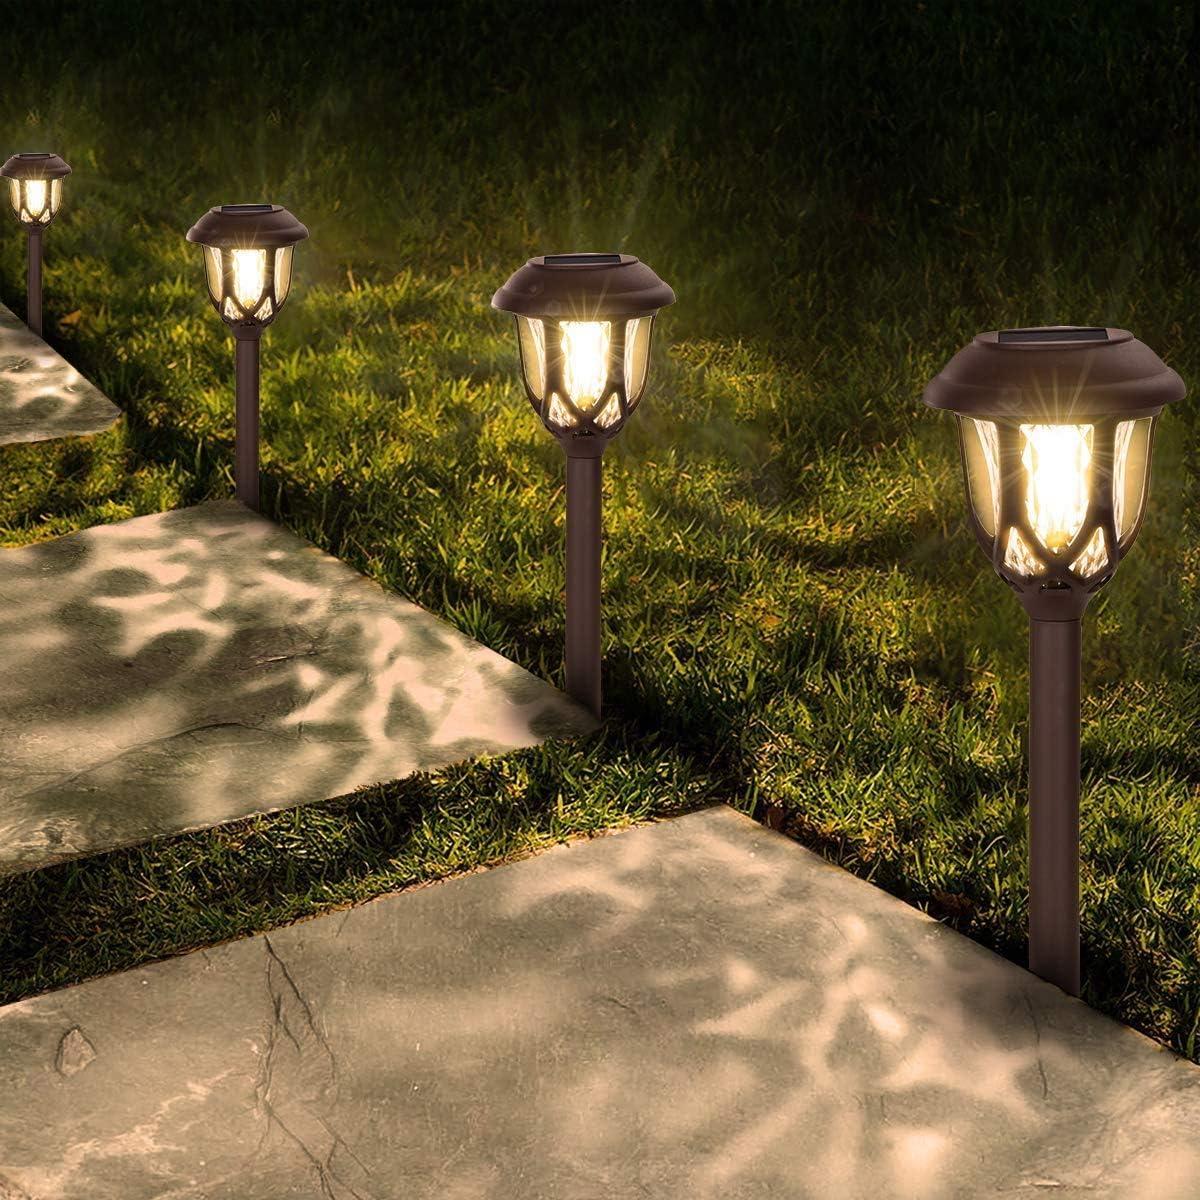 Solar Lights Outdoor Decorative,10 Packs Solar Pathway Lights,Pathway Lights Solar Powered,Waterproof Solar Powered Garden Yard Lights for Walkway Sidewalk Driveway-Warm Light